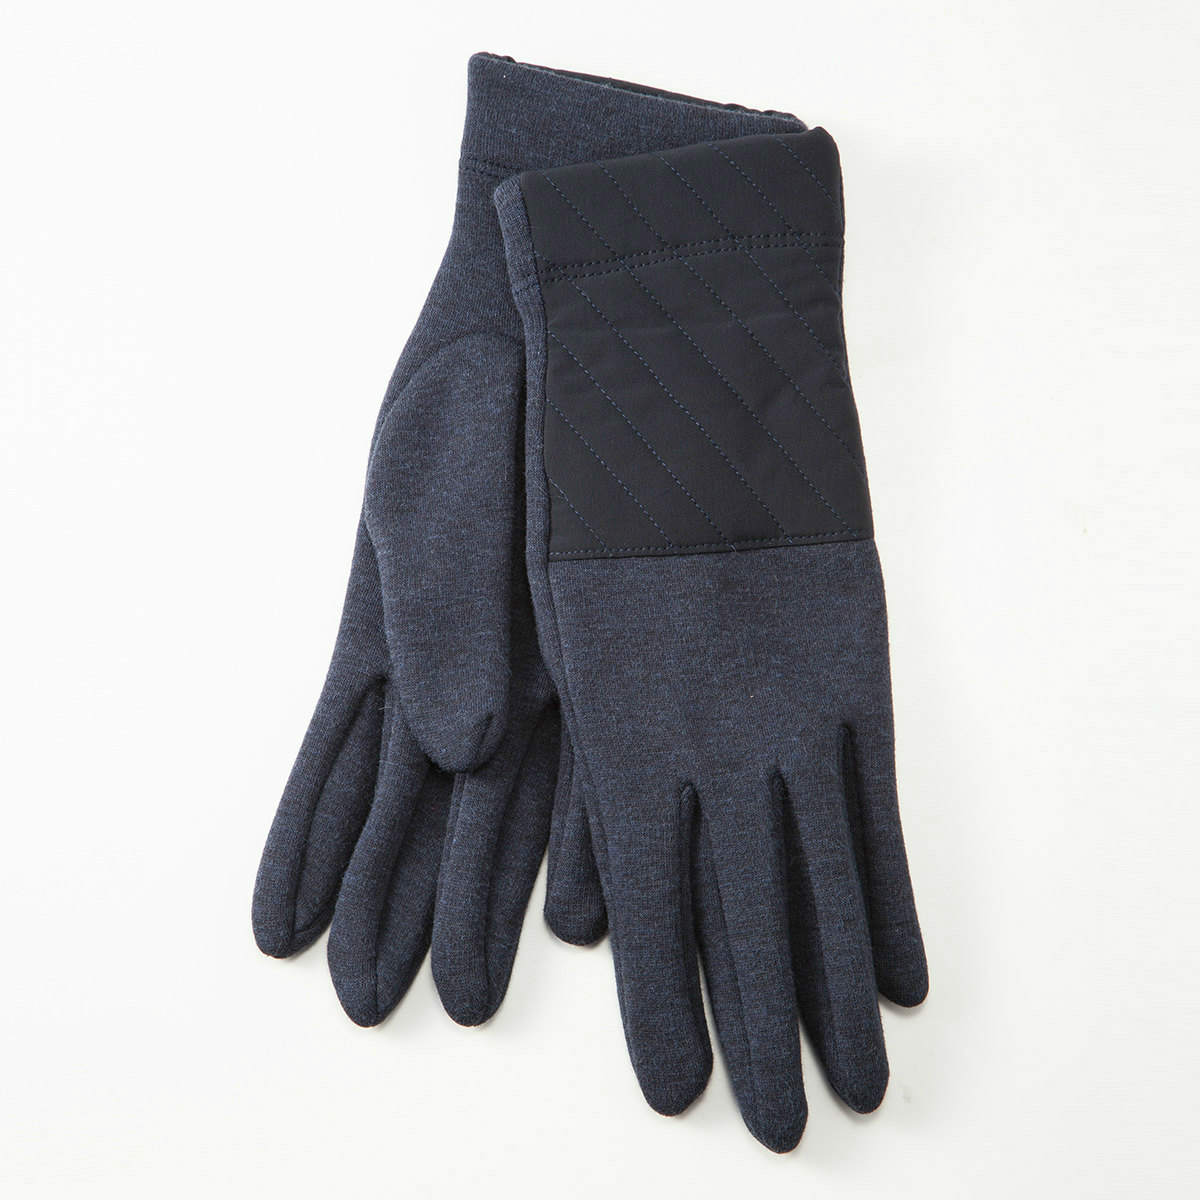 BIYUTE レディース ジャージ手袋 あったか 裏起毛 キルティングとの切替デザイン ストレッチ素材 Mサイズ 全3色